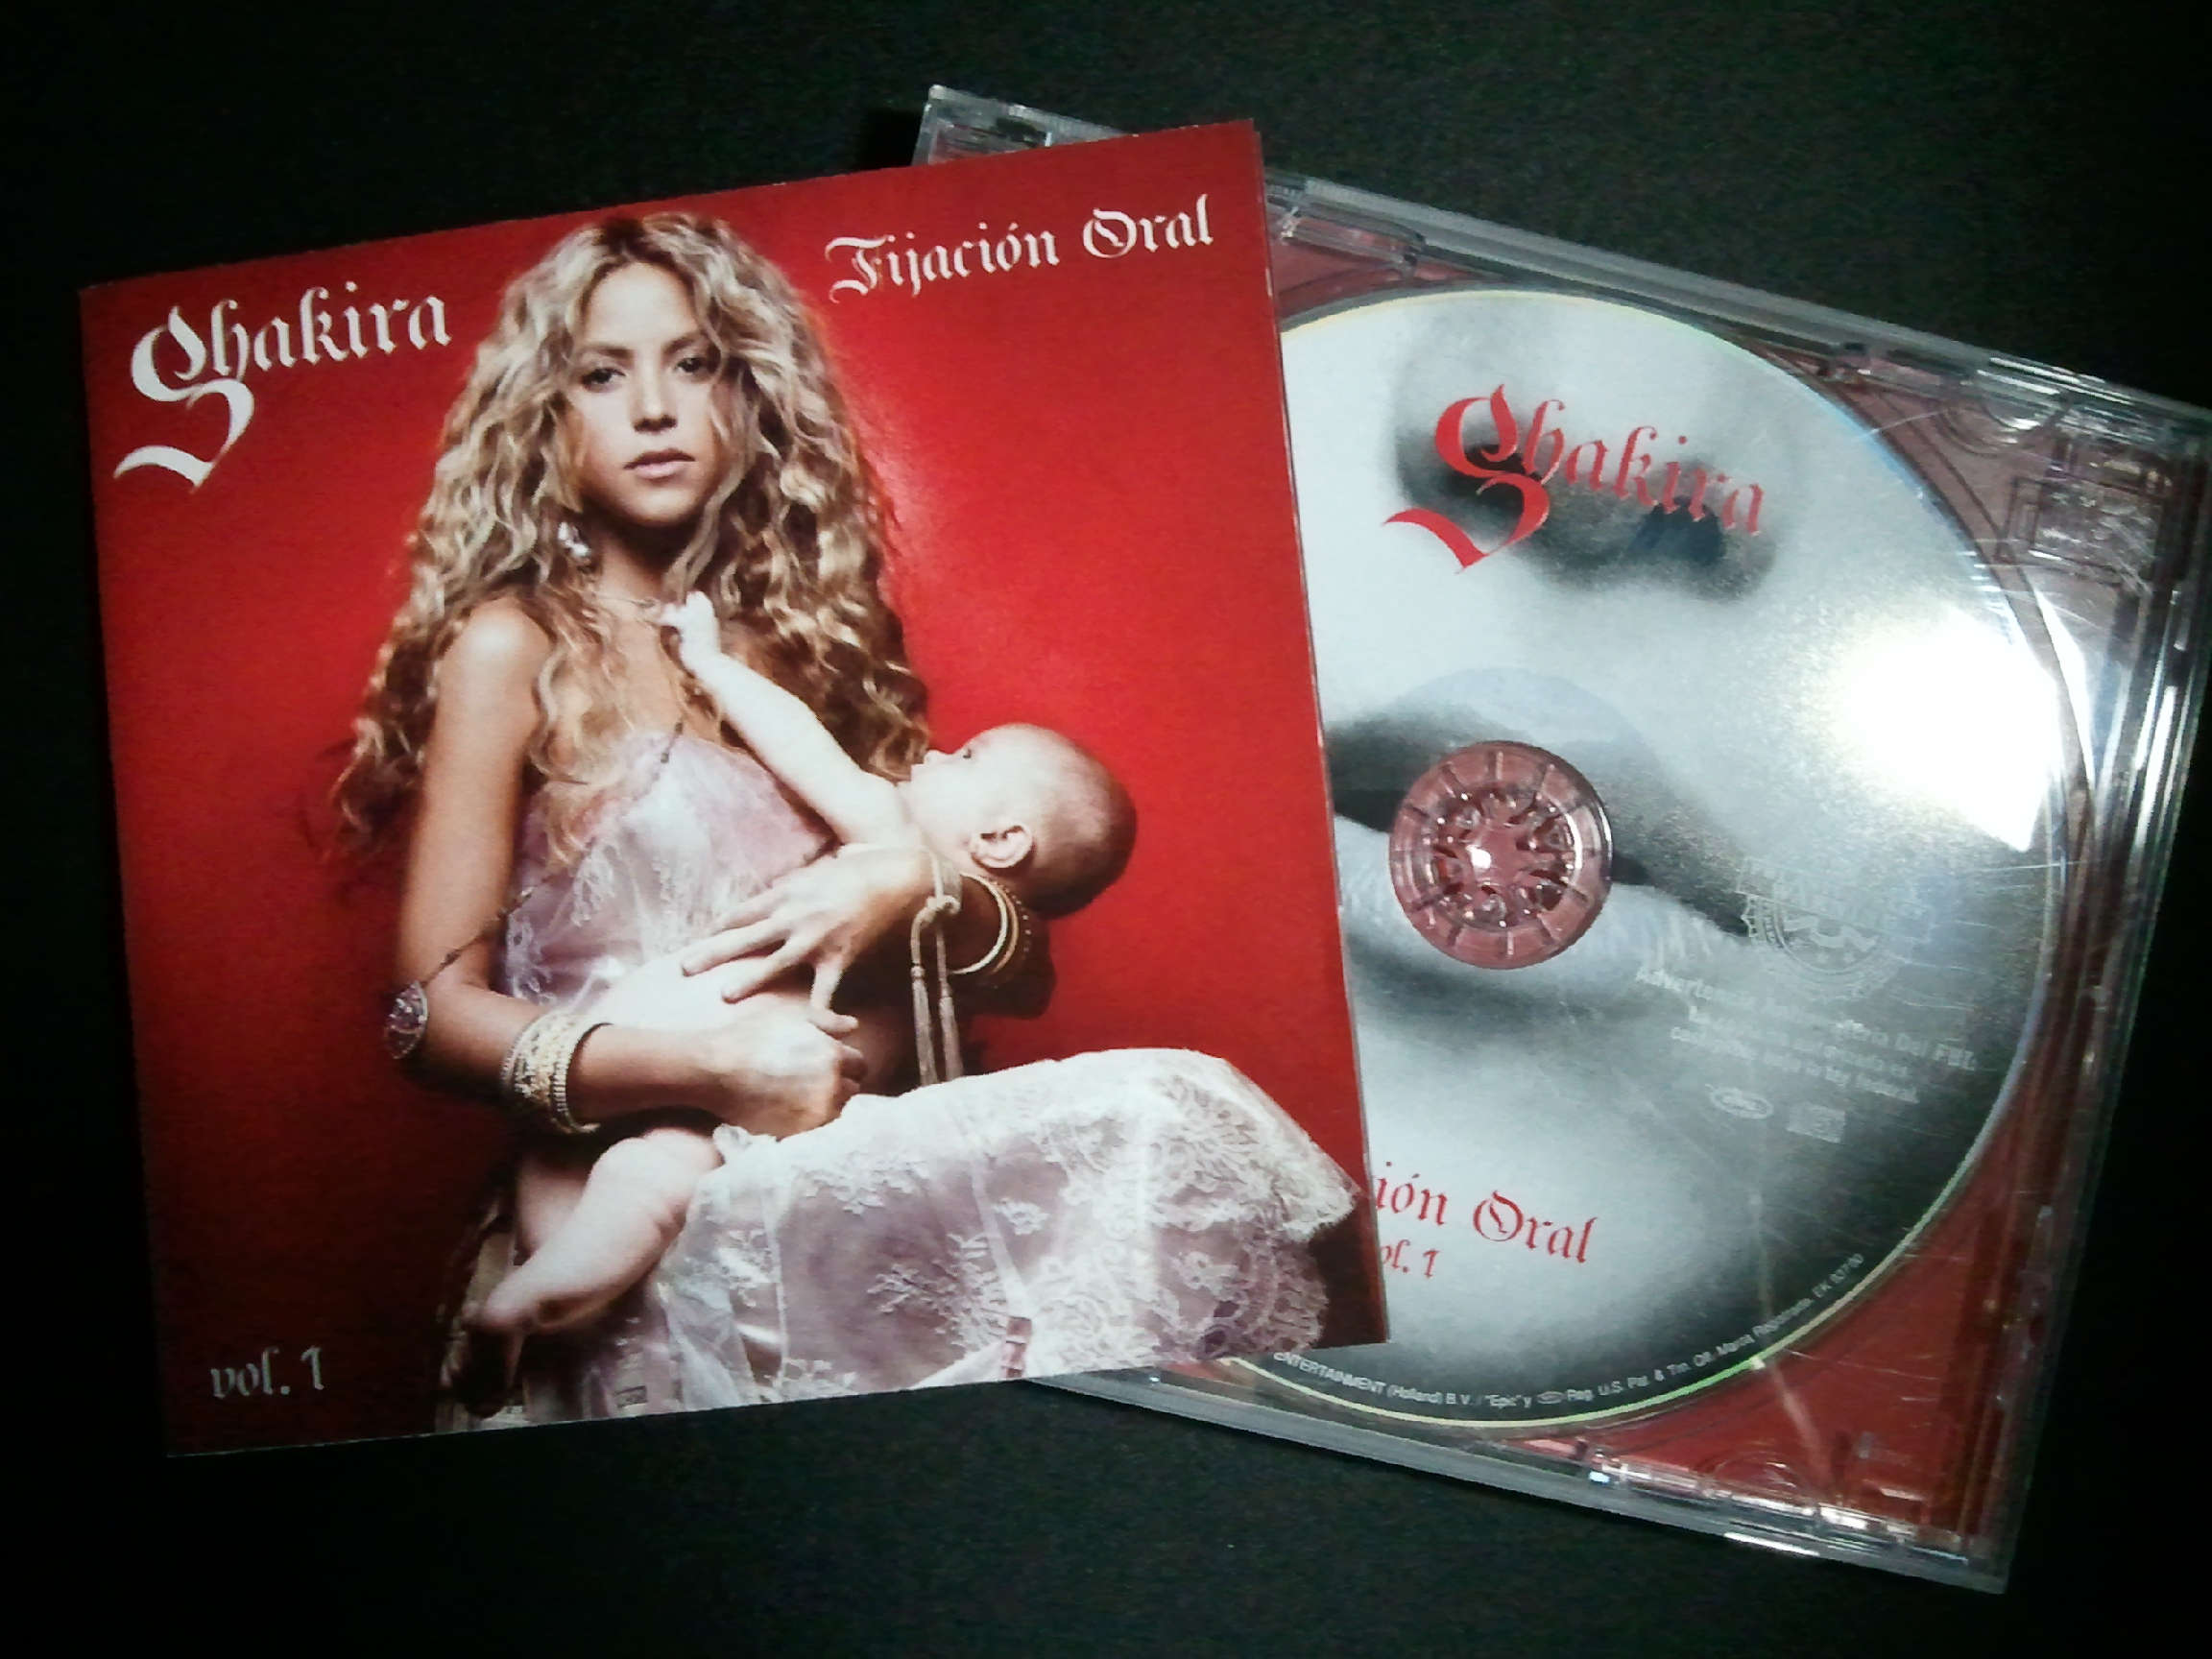 Shakira Oral Fixation vol.1